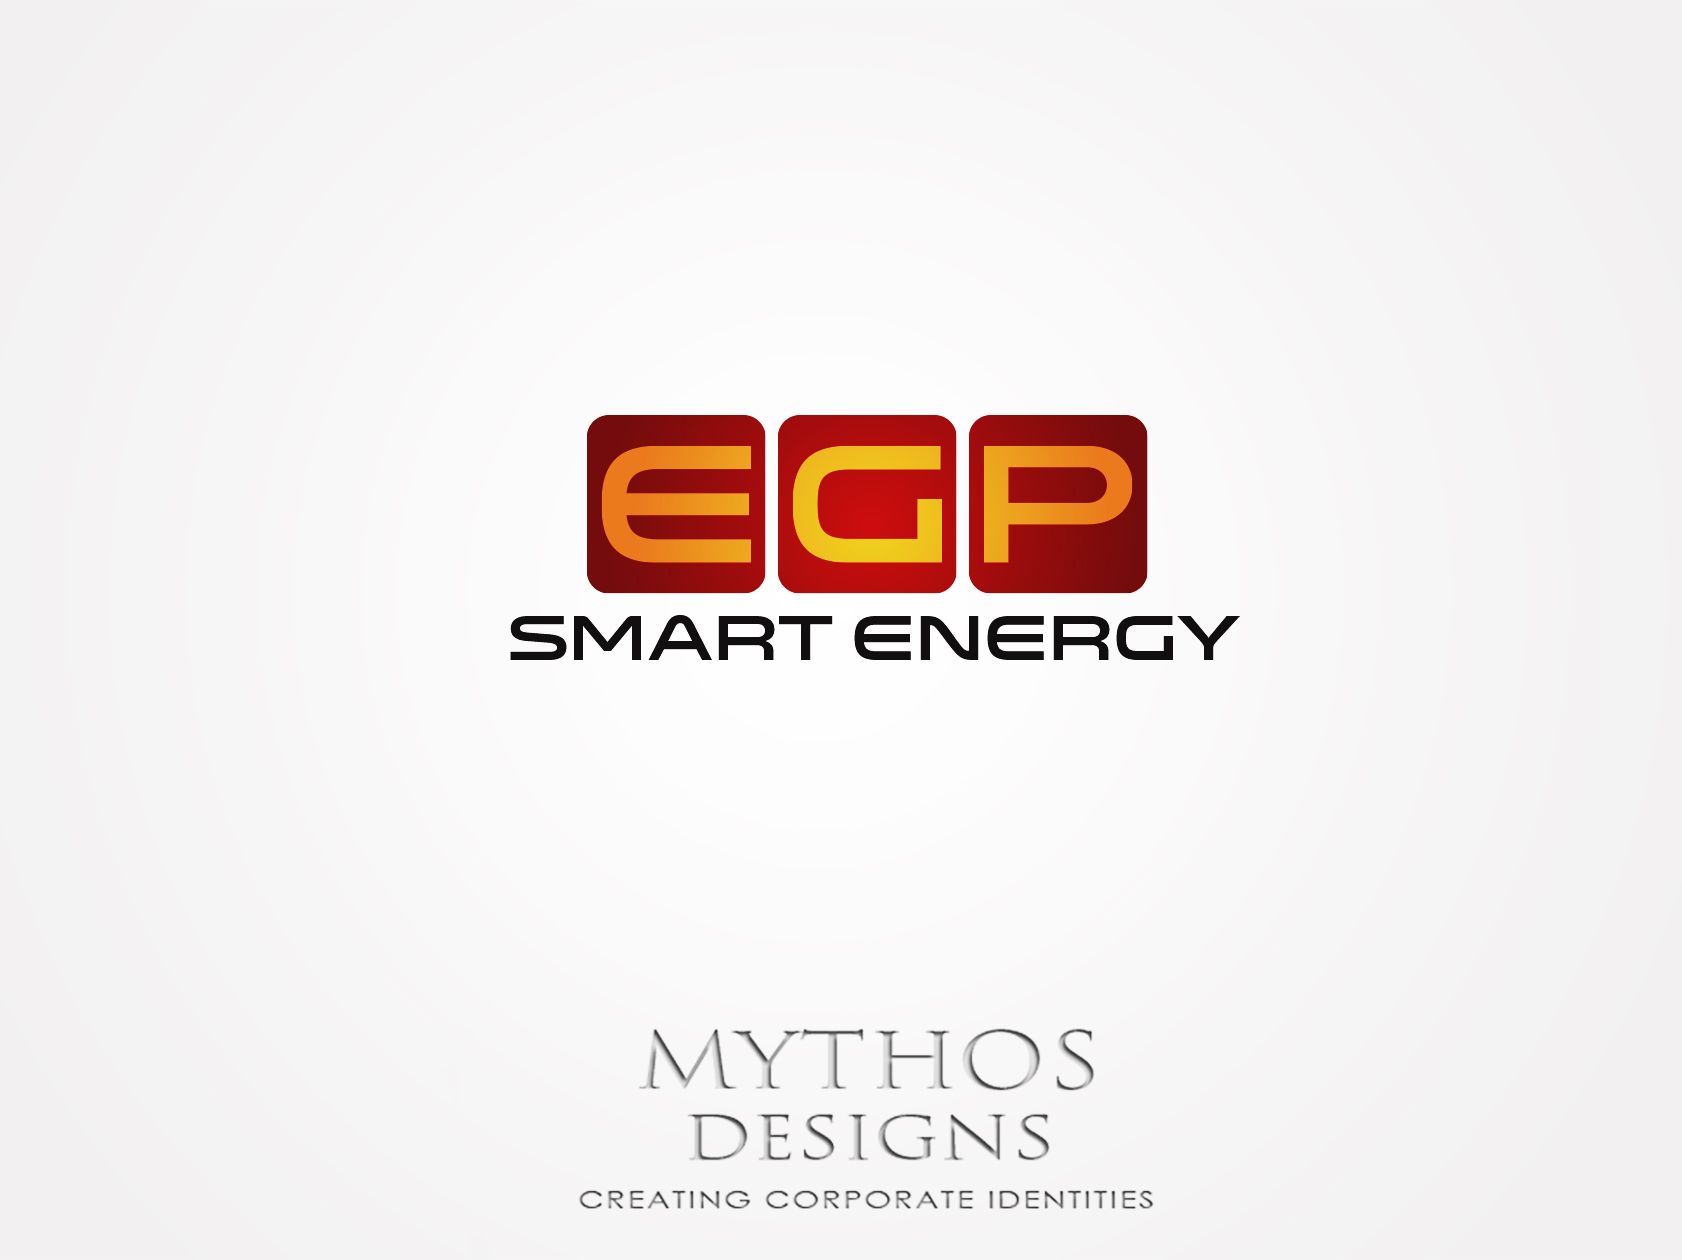 Logo Design by Mythos Designs - Entry No. 16 in the Logo Design Contest Captivating Logo Design for EGP Smart Energy.